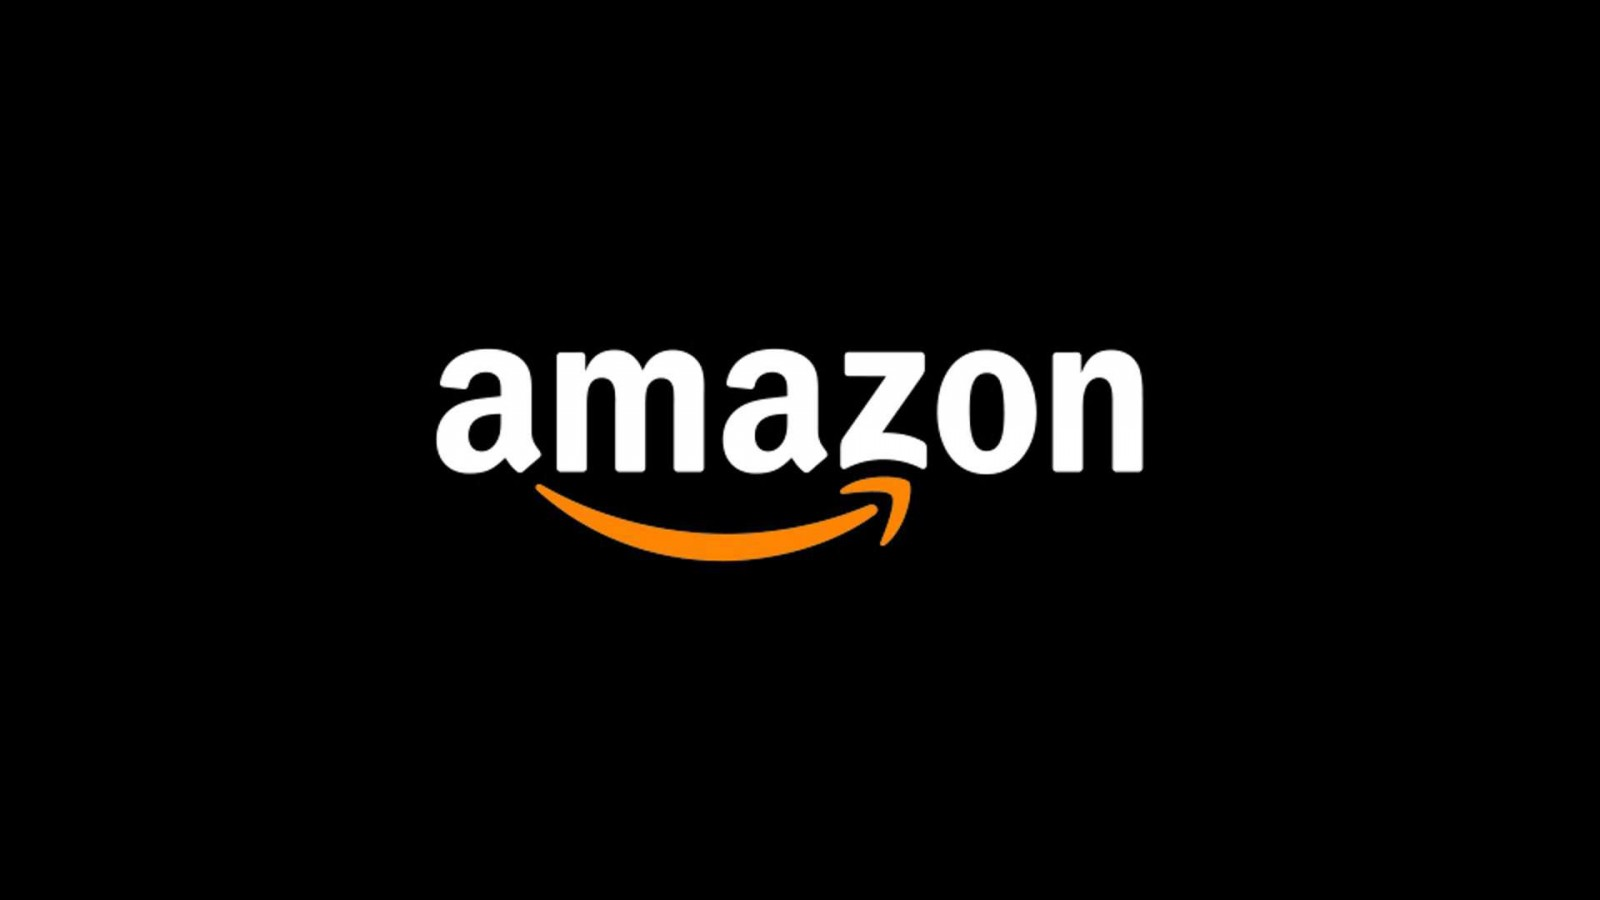 Amazon-Logo-Black